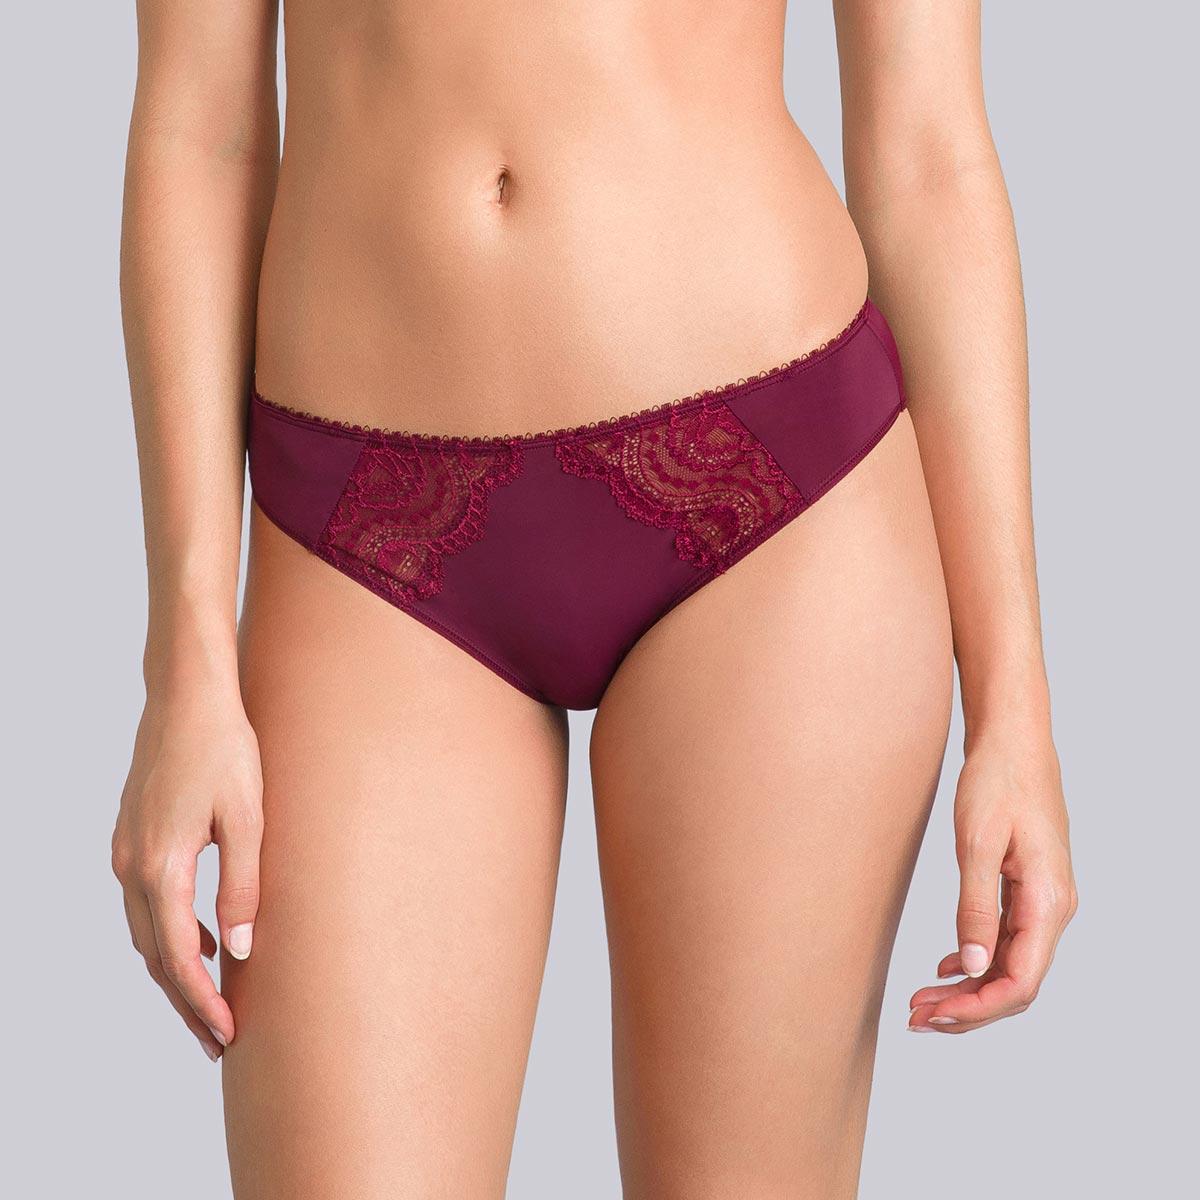 Culotte Mini violette bordeaux - Flower Elegance-PLAYTEX